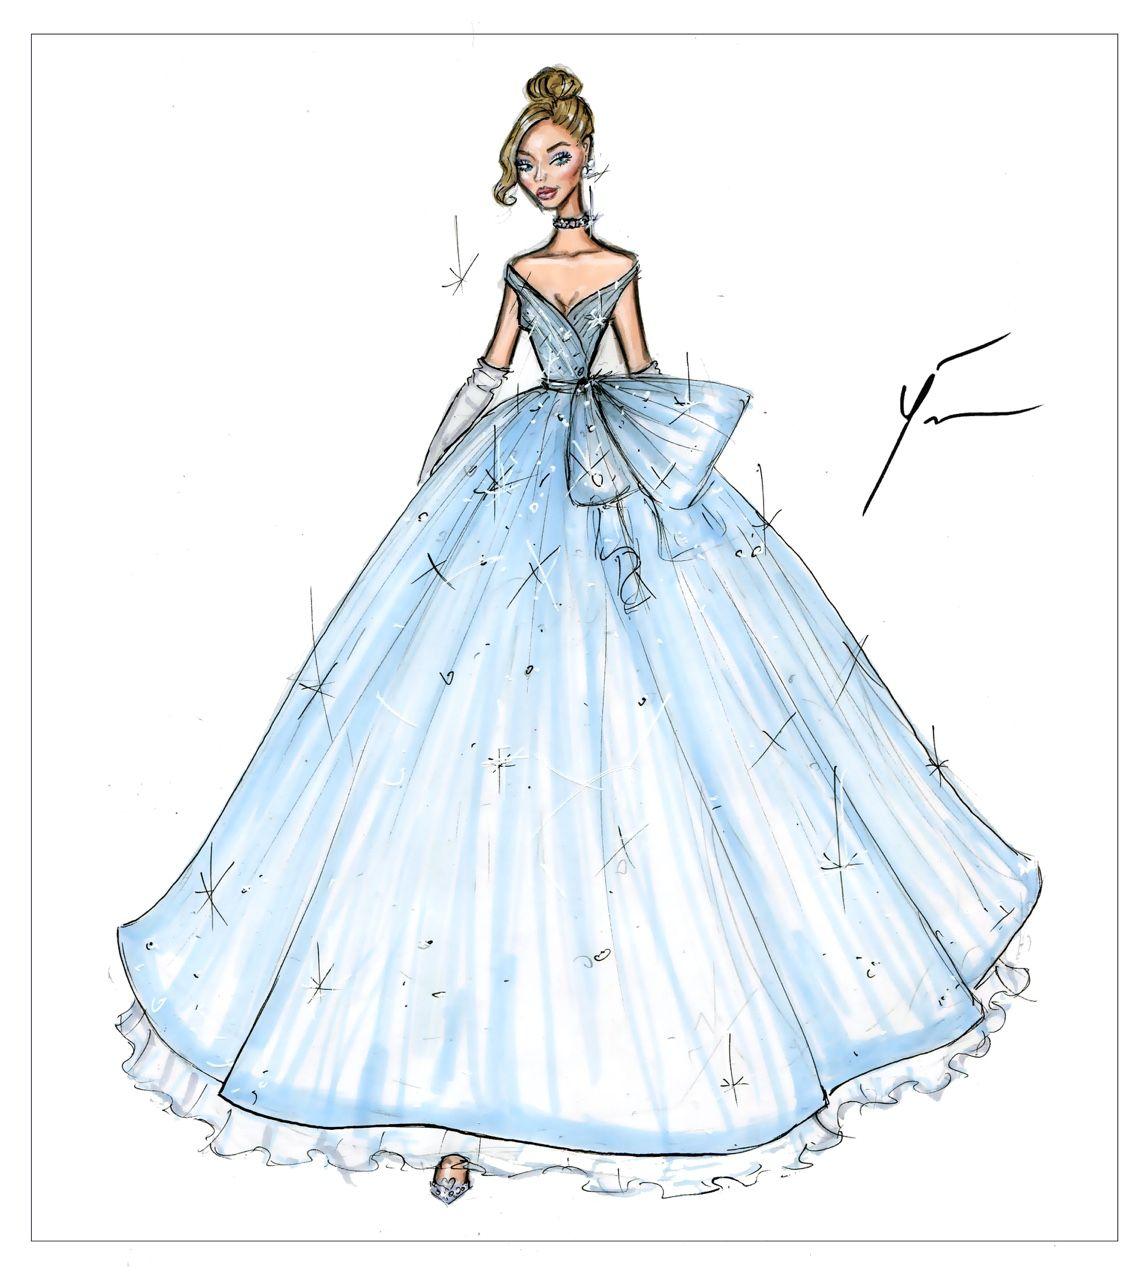 Disney Princesses 'Cinderella' by Yigit Ozcakmak   disney ...